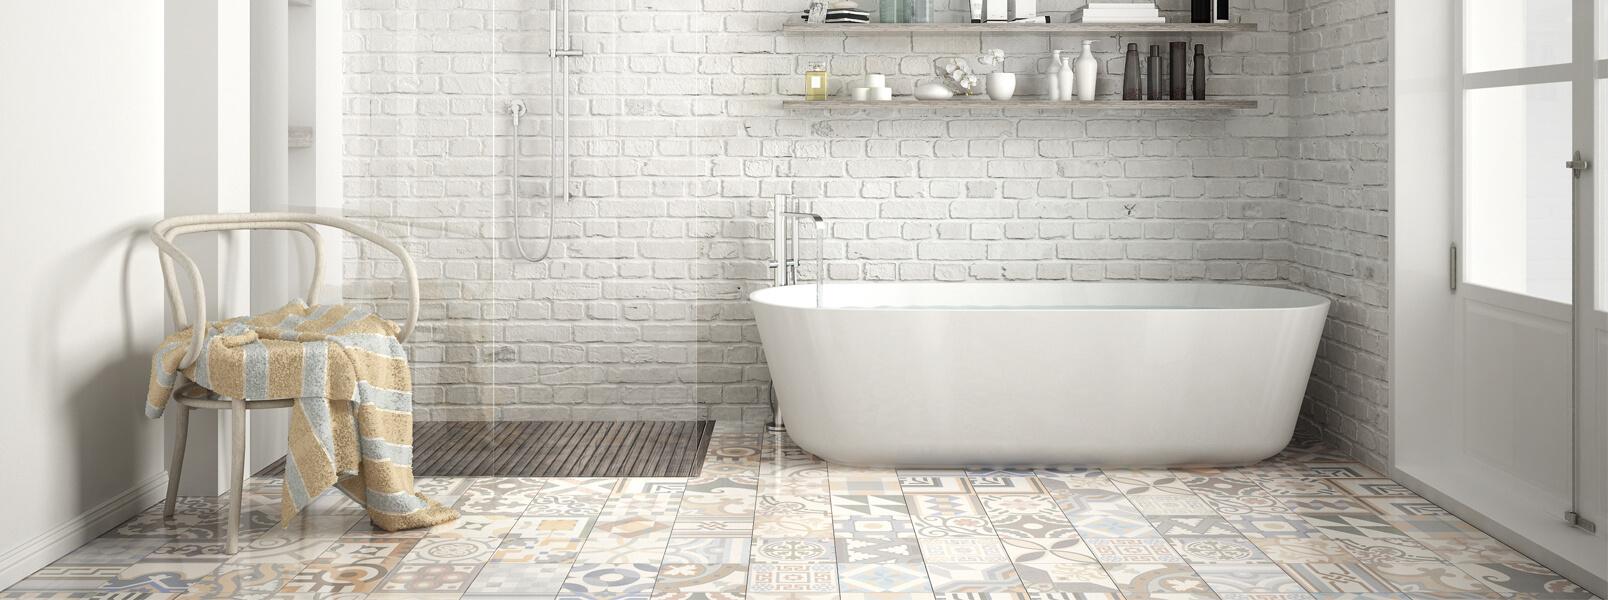 2019 Bathroom Trends City Tile Vancouver Island